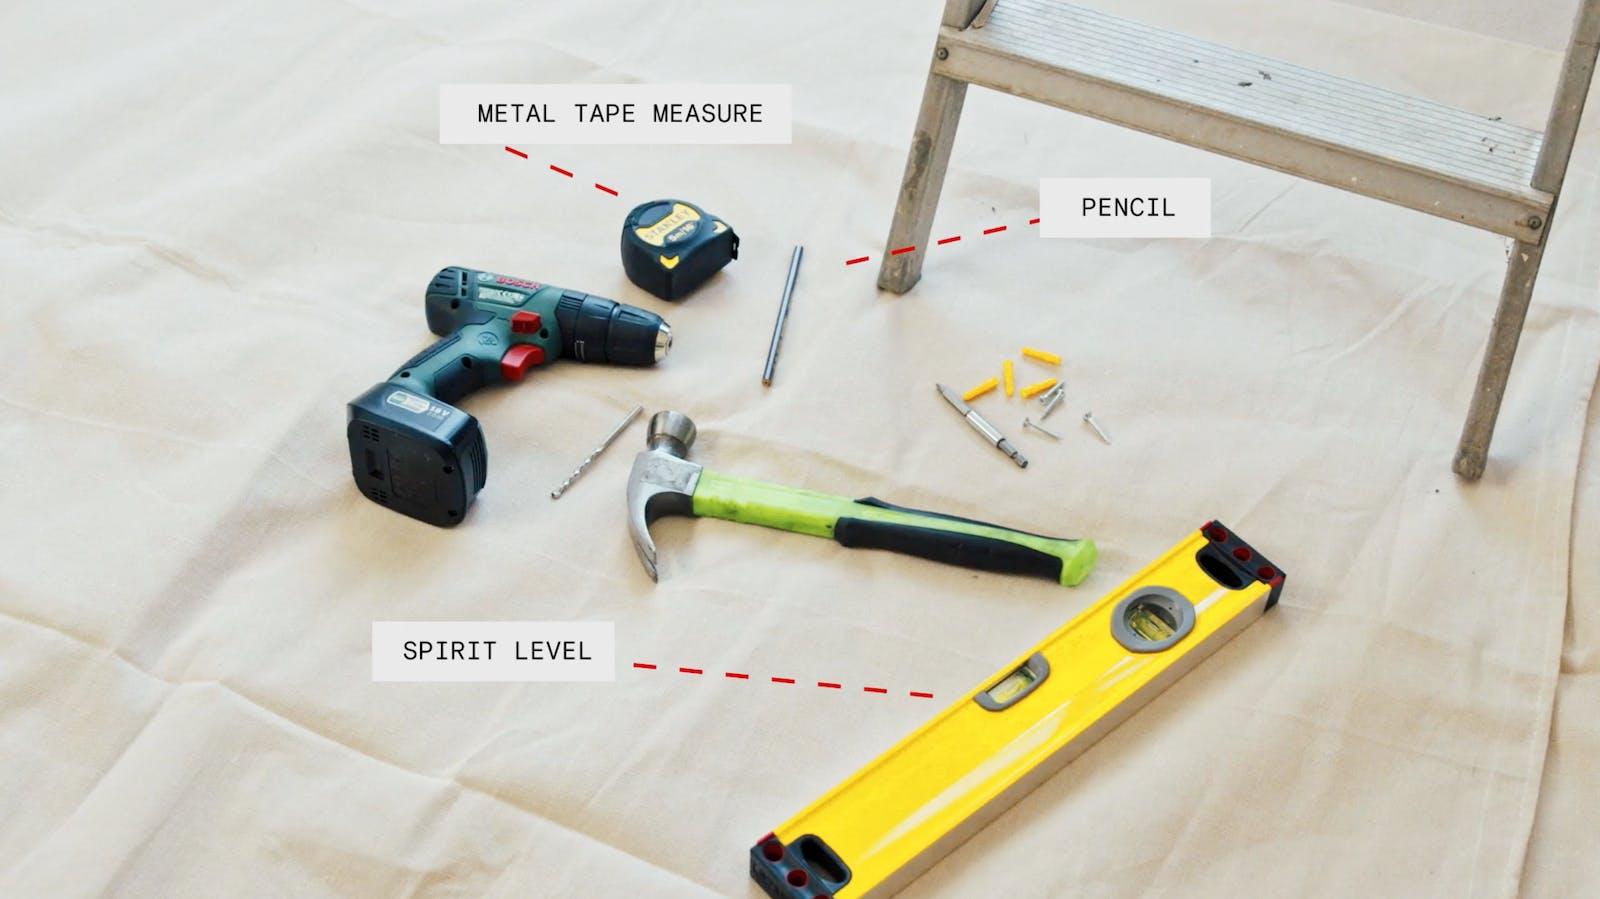 Metal tape measure, pencil and spirit level on floor